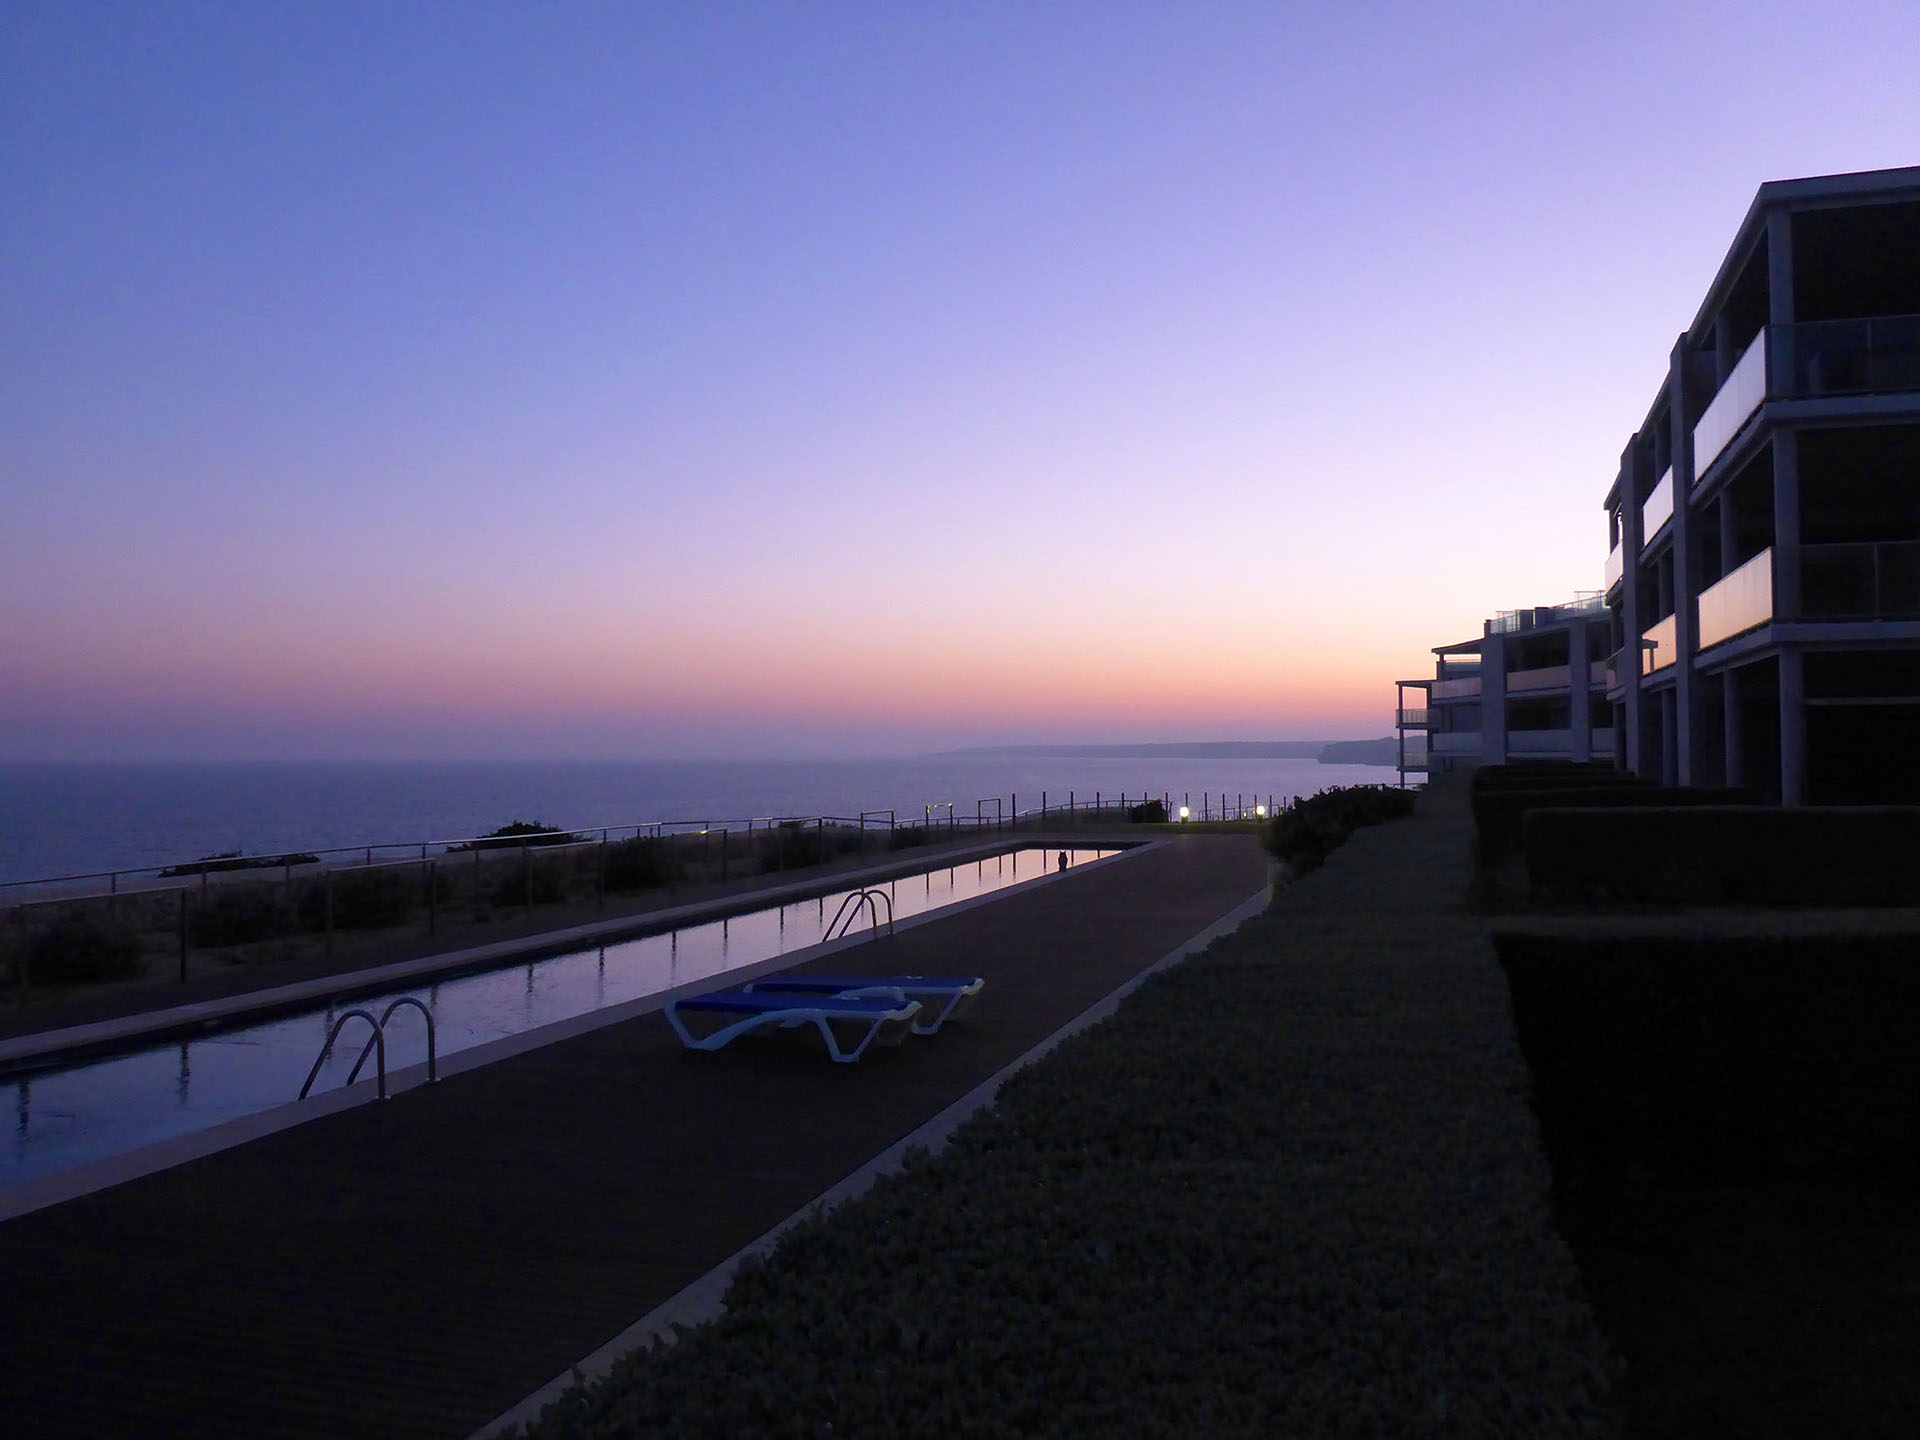 Atemberaubender Ausblick: Luxuriöses Apartment mit Garten in erster Meereslinie